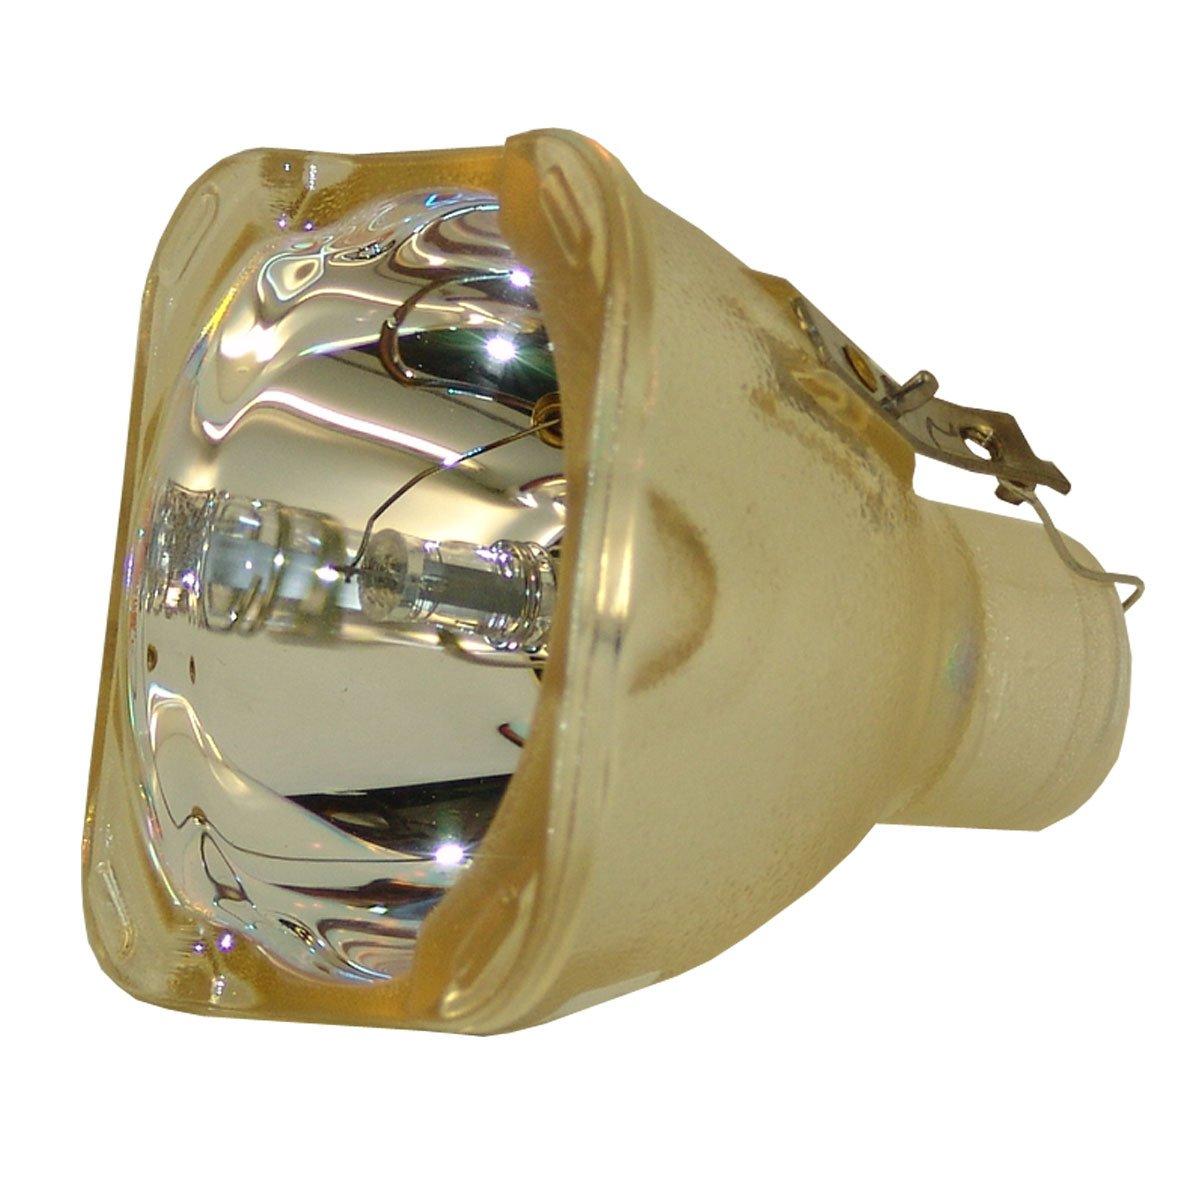 Lutema OEM プロジェクター交換用ランプ ハウジング/電球付き Vivitek D965用 Platinum (Brighter/Durable) B07KTL44MB Lamp Only Platinum (Brighter/Durable)